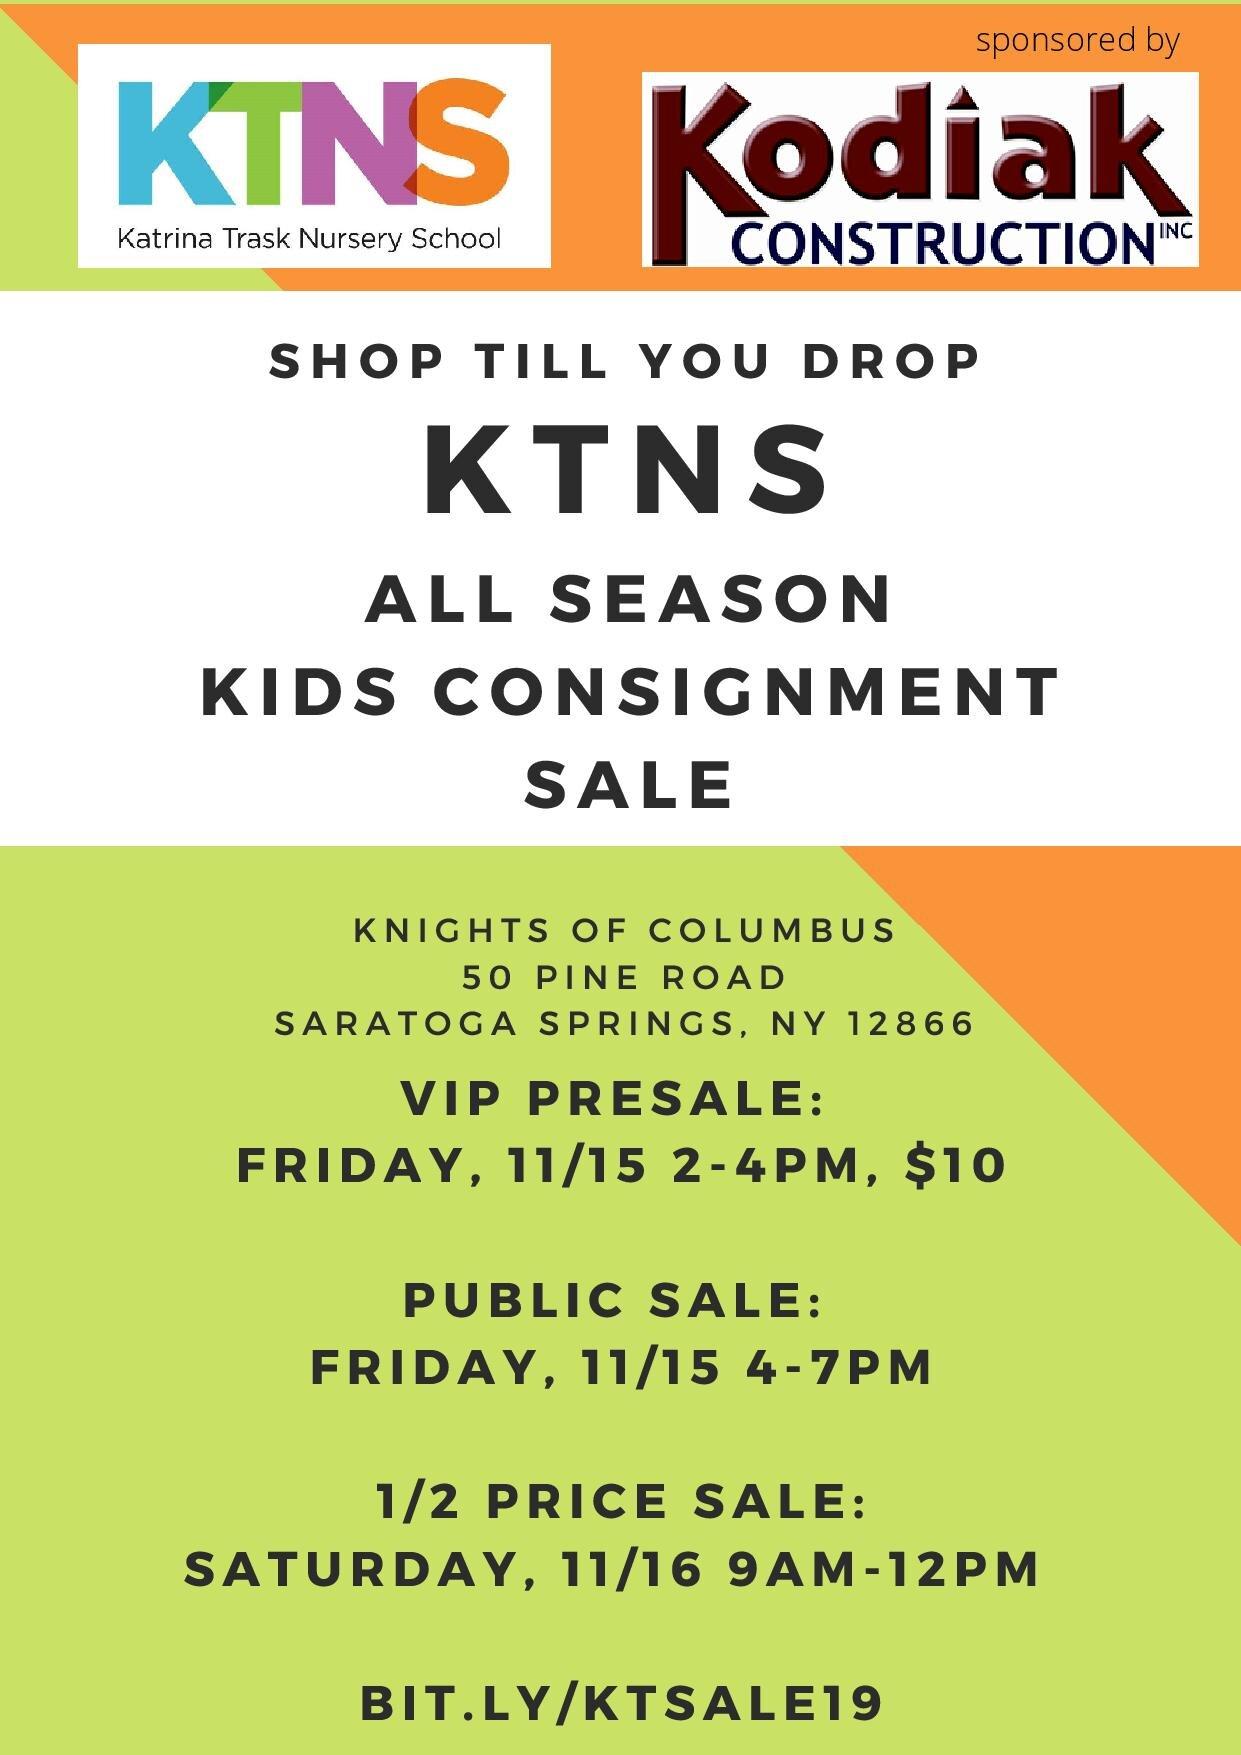 KT Flyer with Kodiak Sponsor name-page-001.jpg